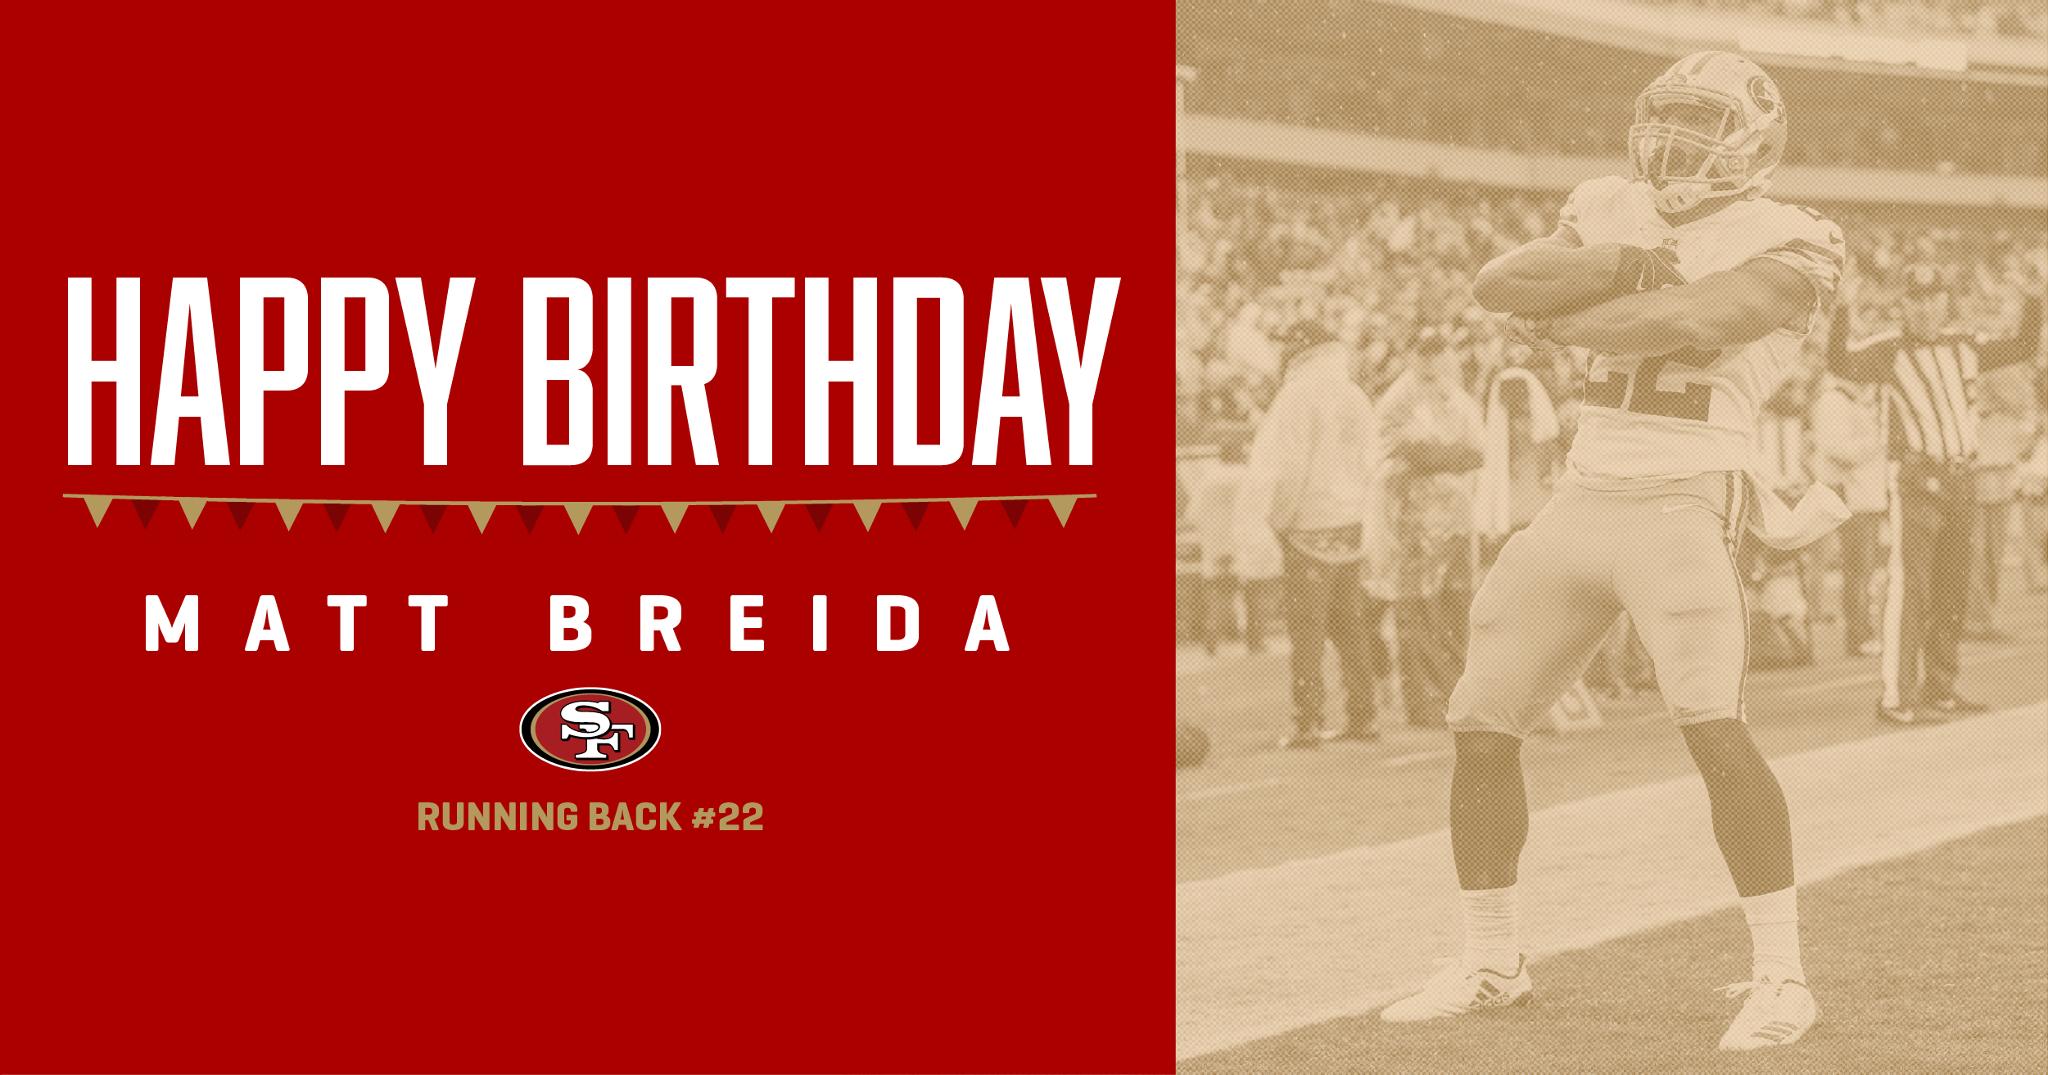 Happy Birthday @MattBreida!! ��  Make sure to check out his reddit AMA: https://t.co/VS9XQR6IlV https://t.co/WnuNBOp3d1